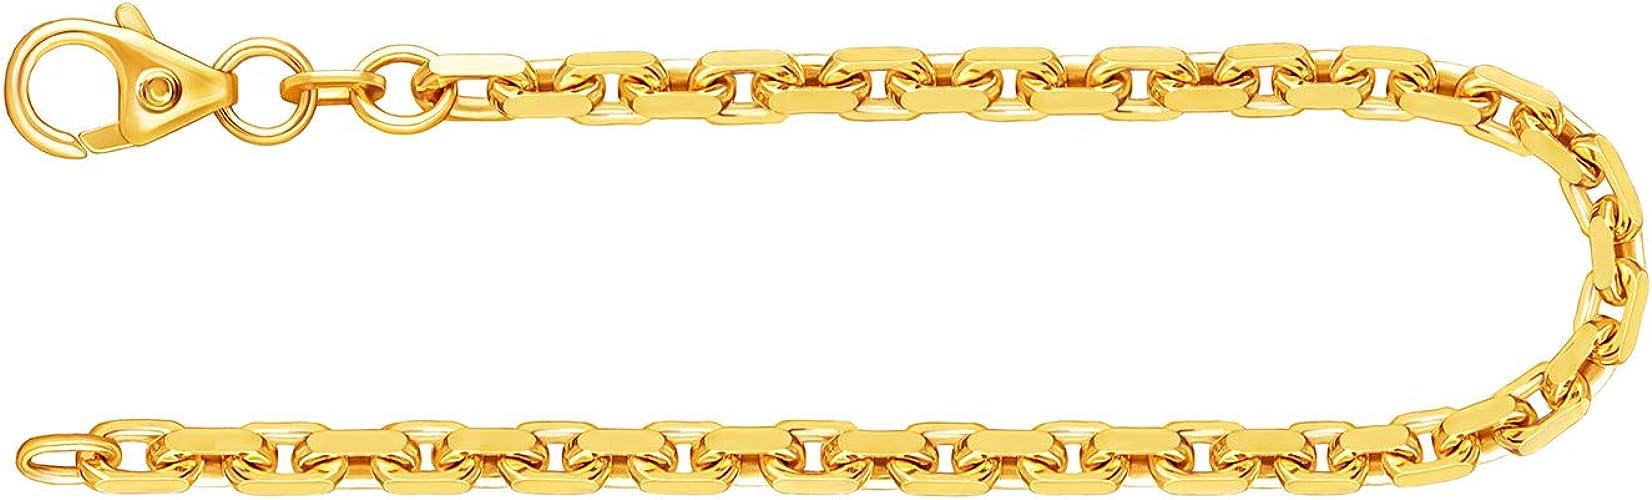 Armband Ankerkette diamantiert Gelbgold 3338 K, Länge 21